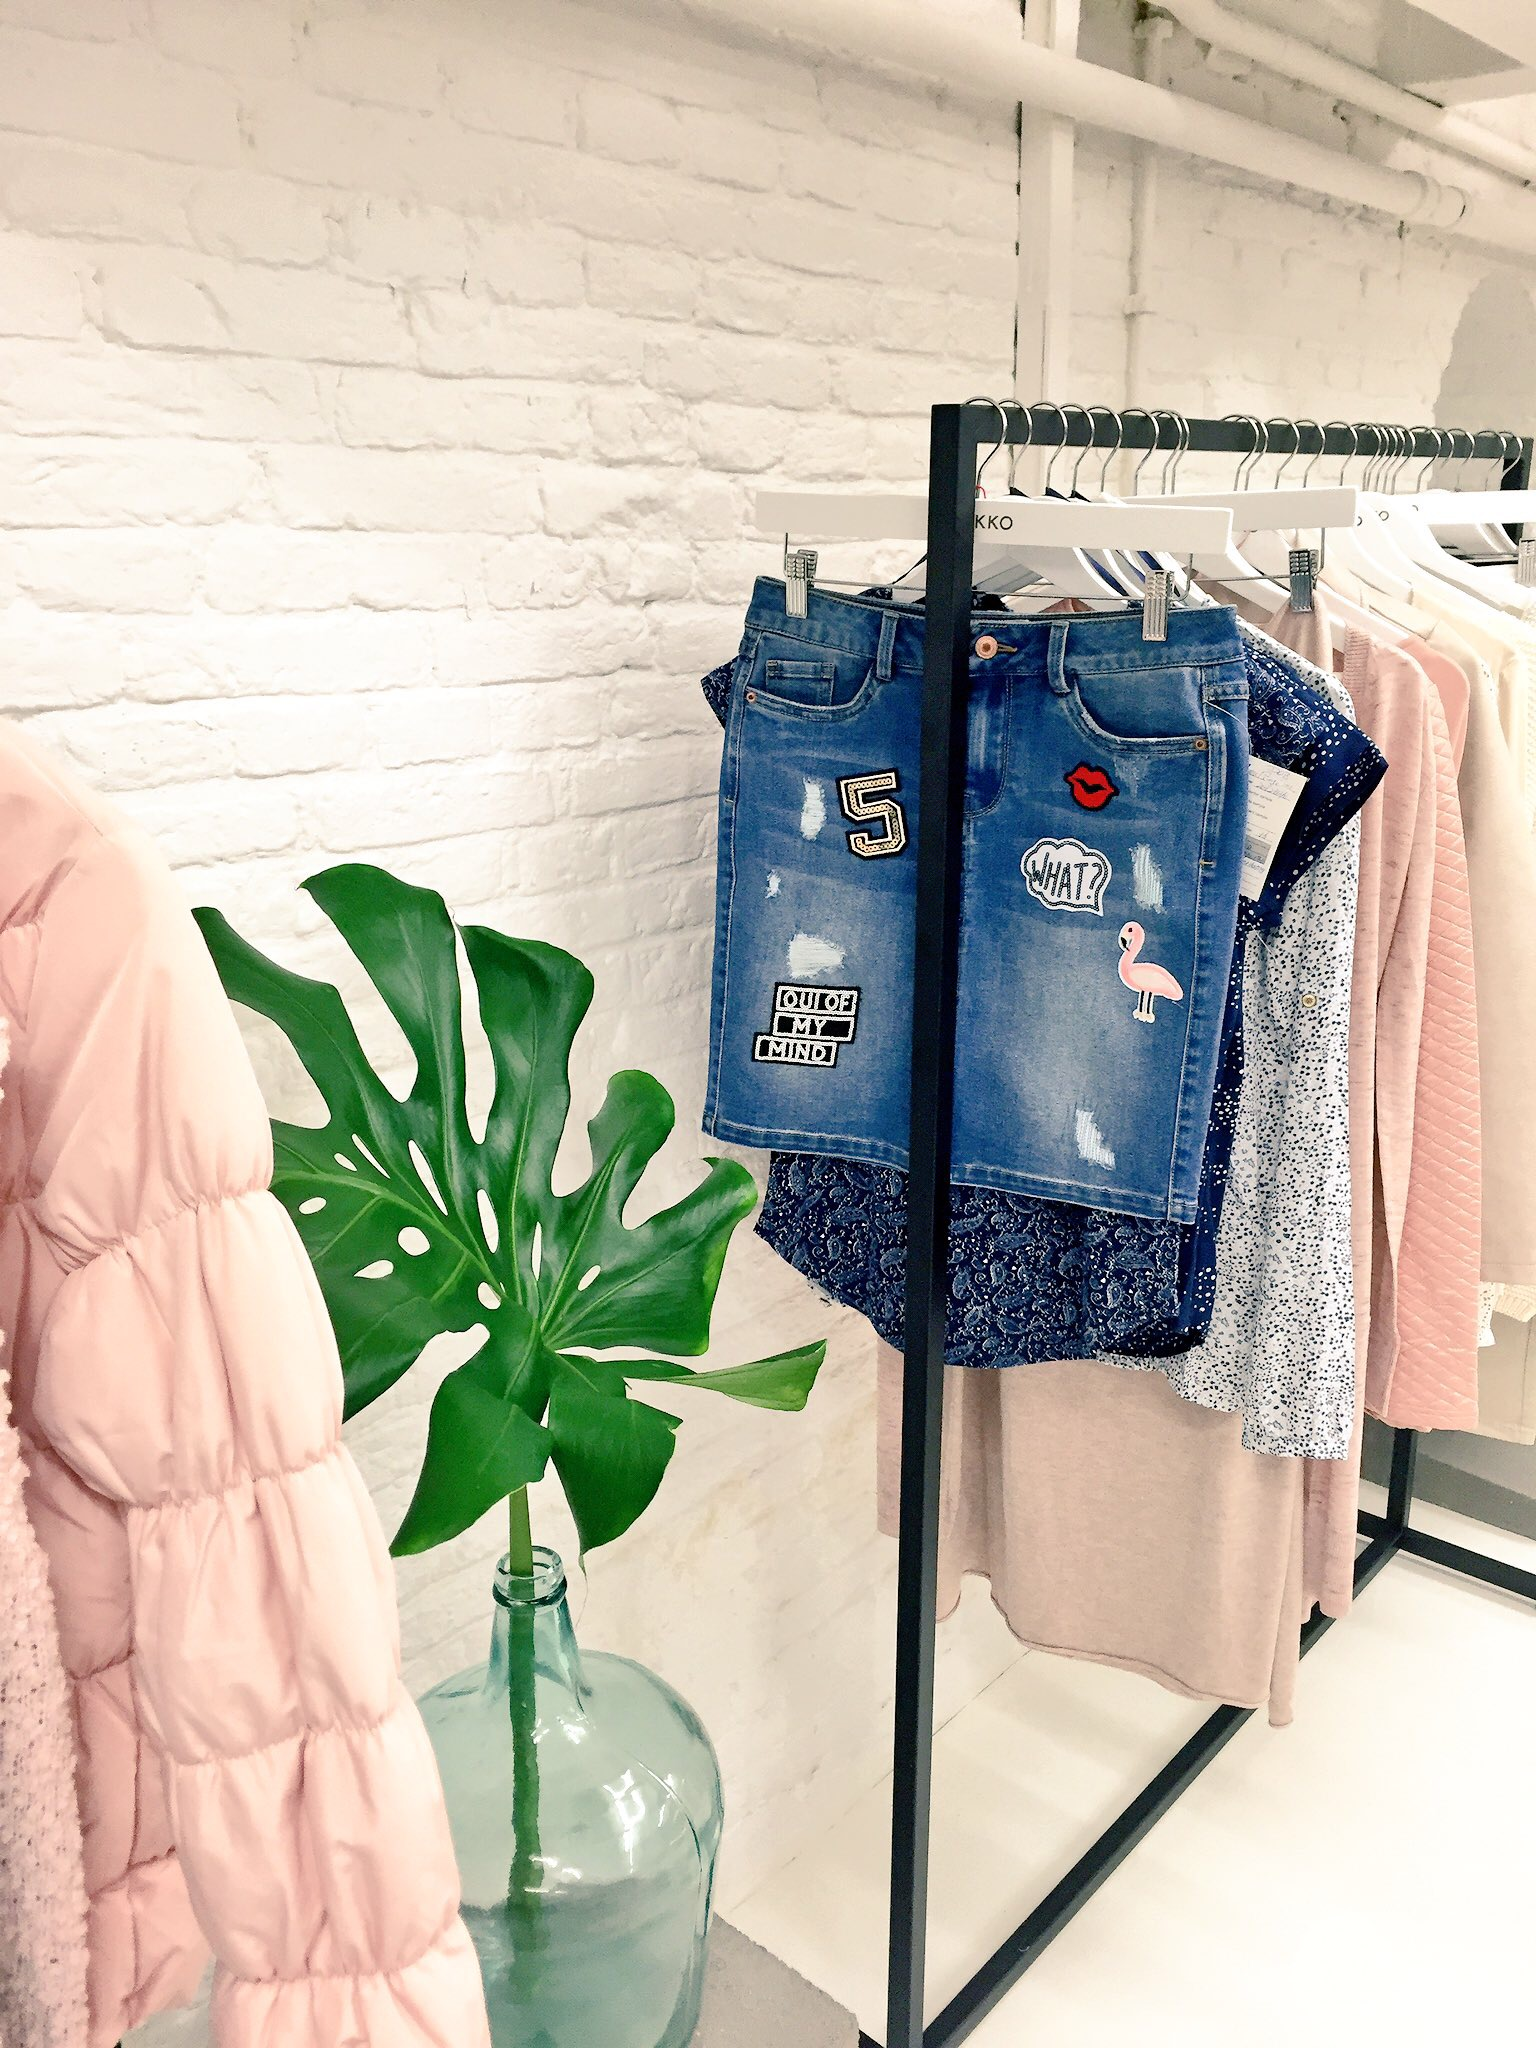 Fashion | Zó scoor je je kledingstuk voor de beste prijs